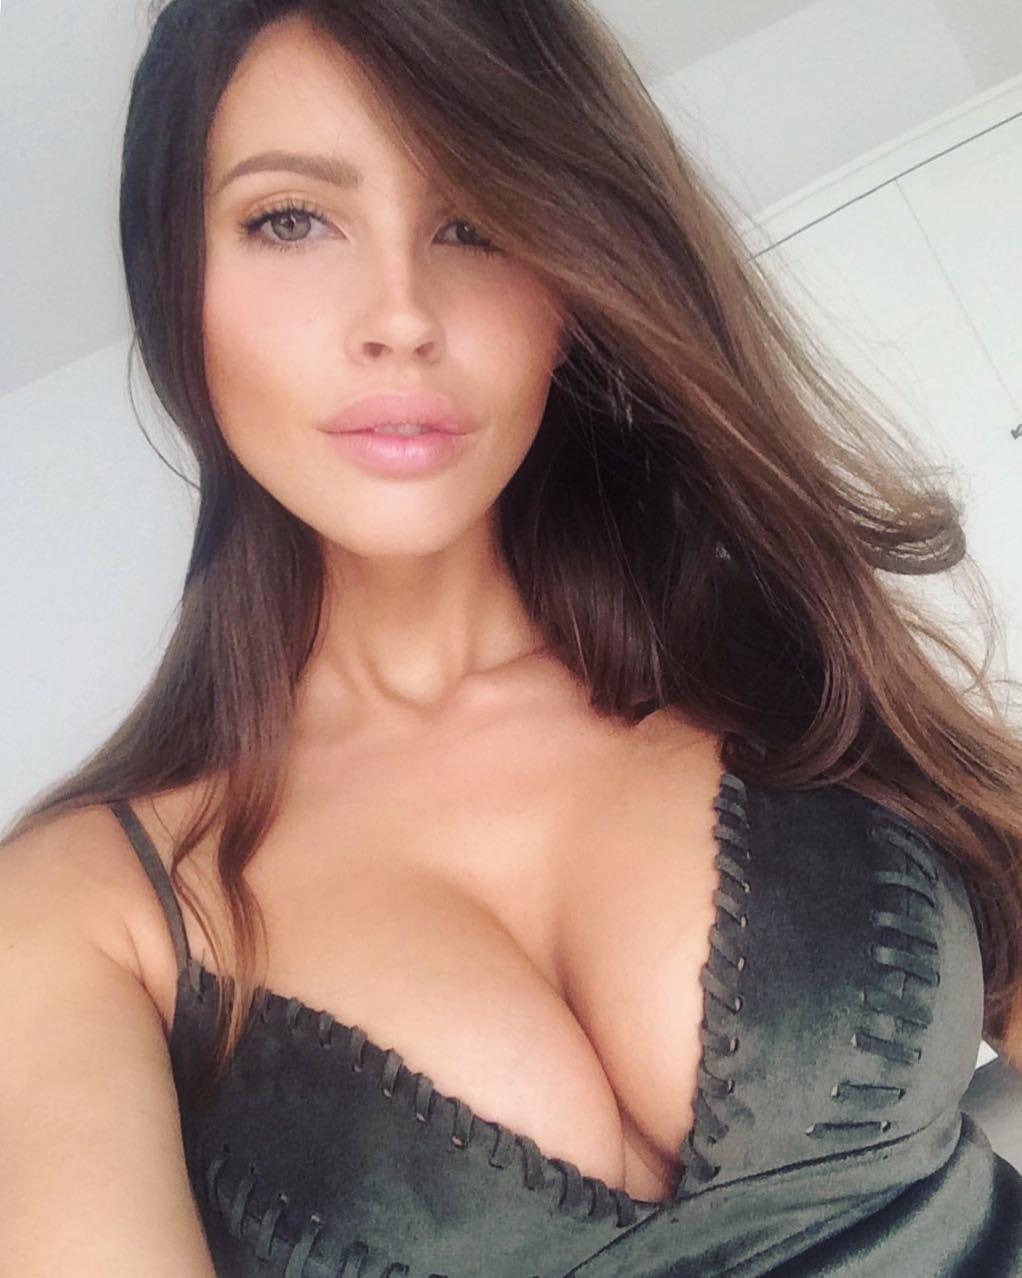 Selfie Lucia Javorcekova nude photos 2019